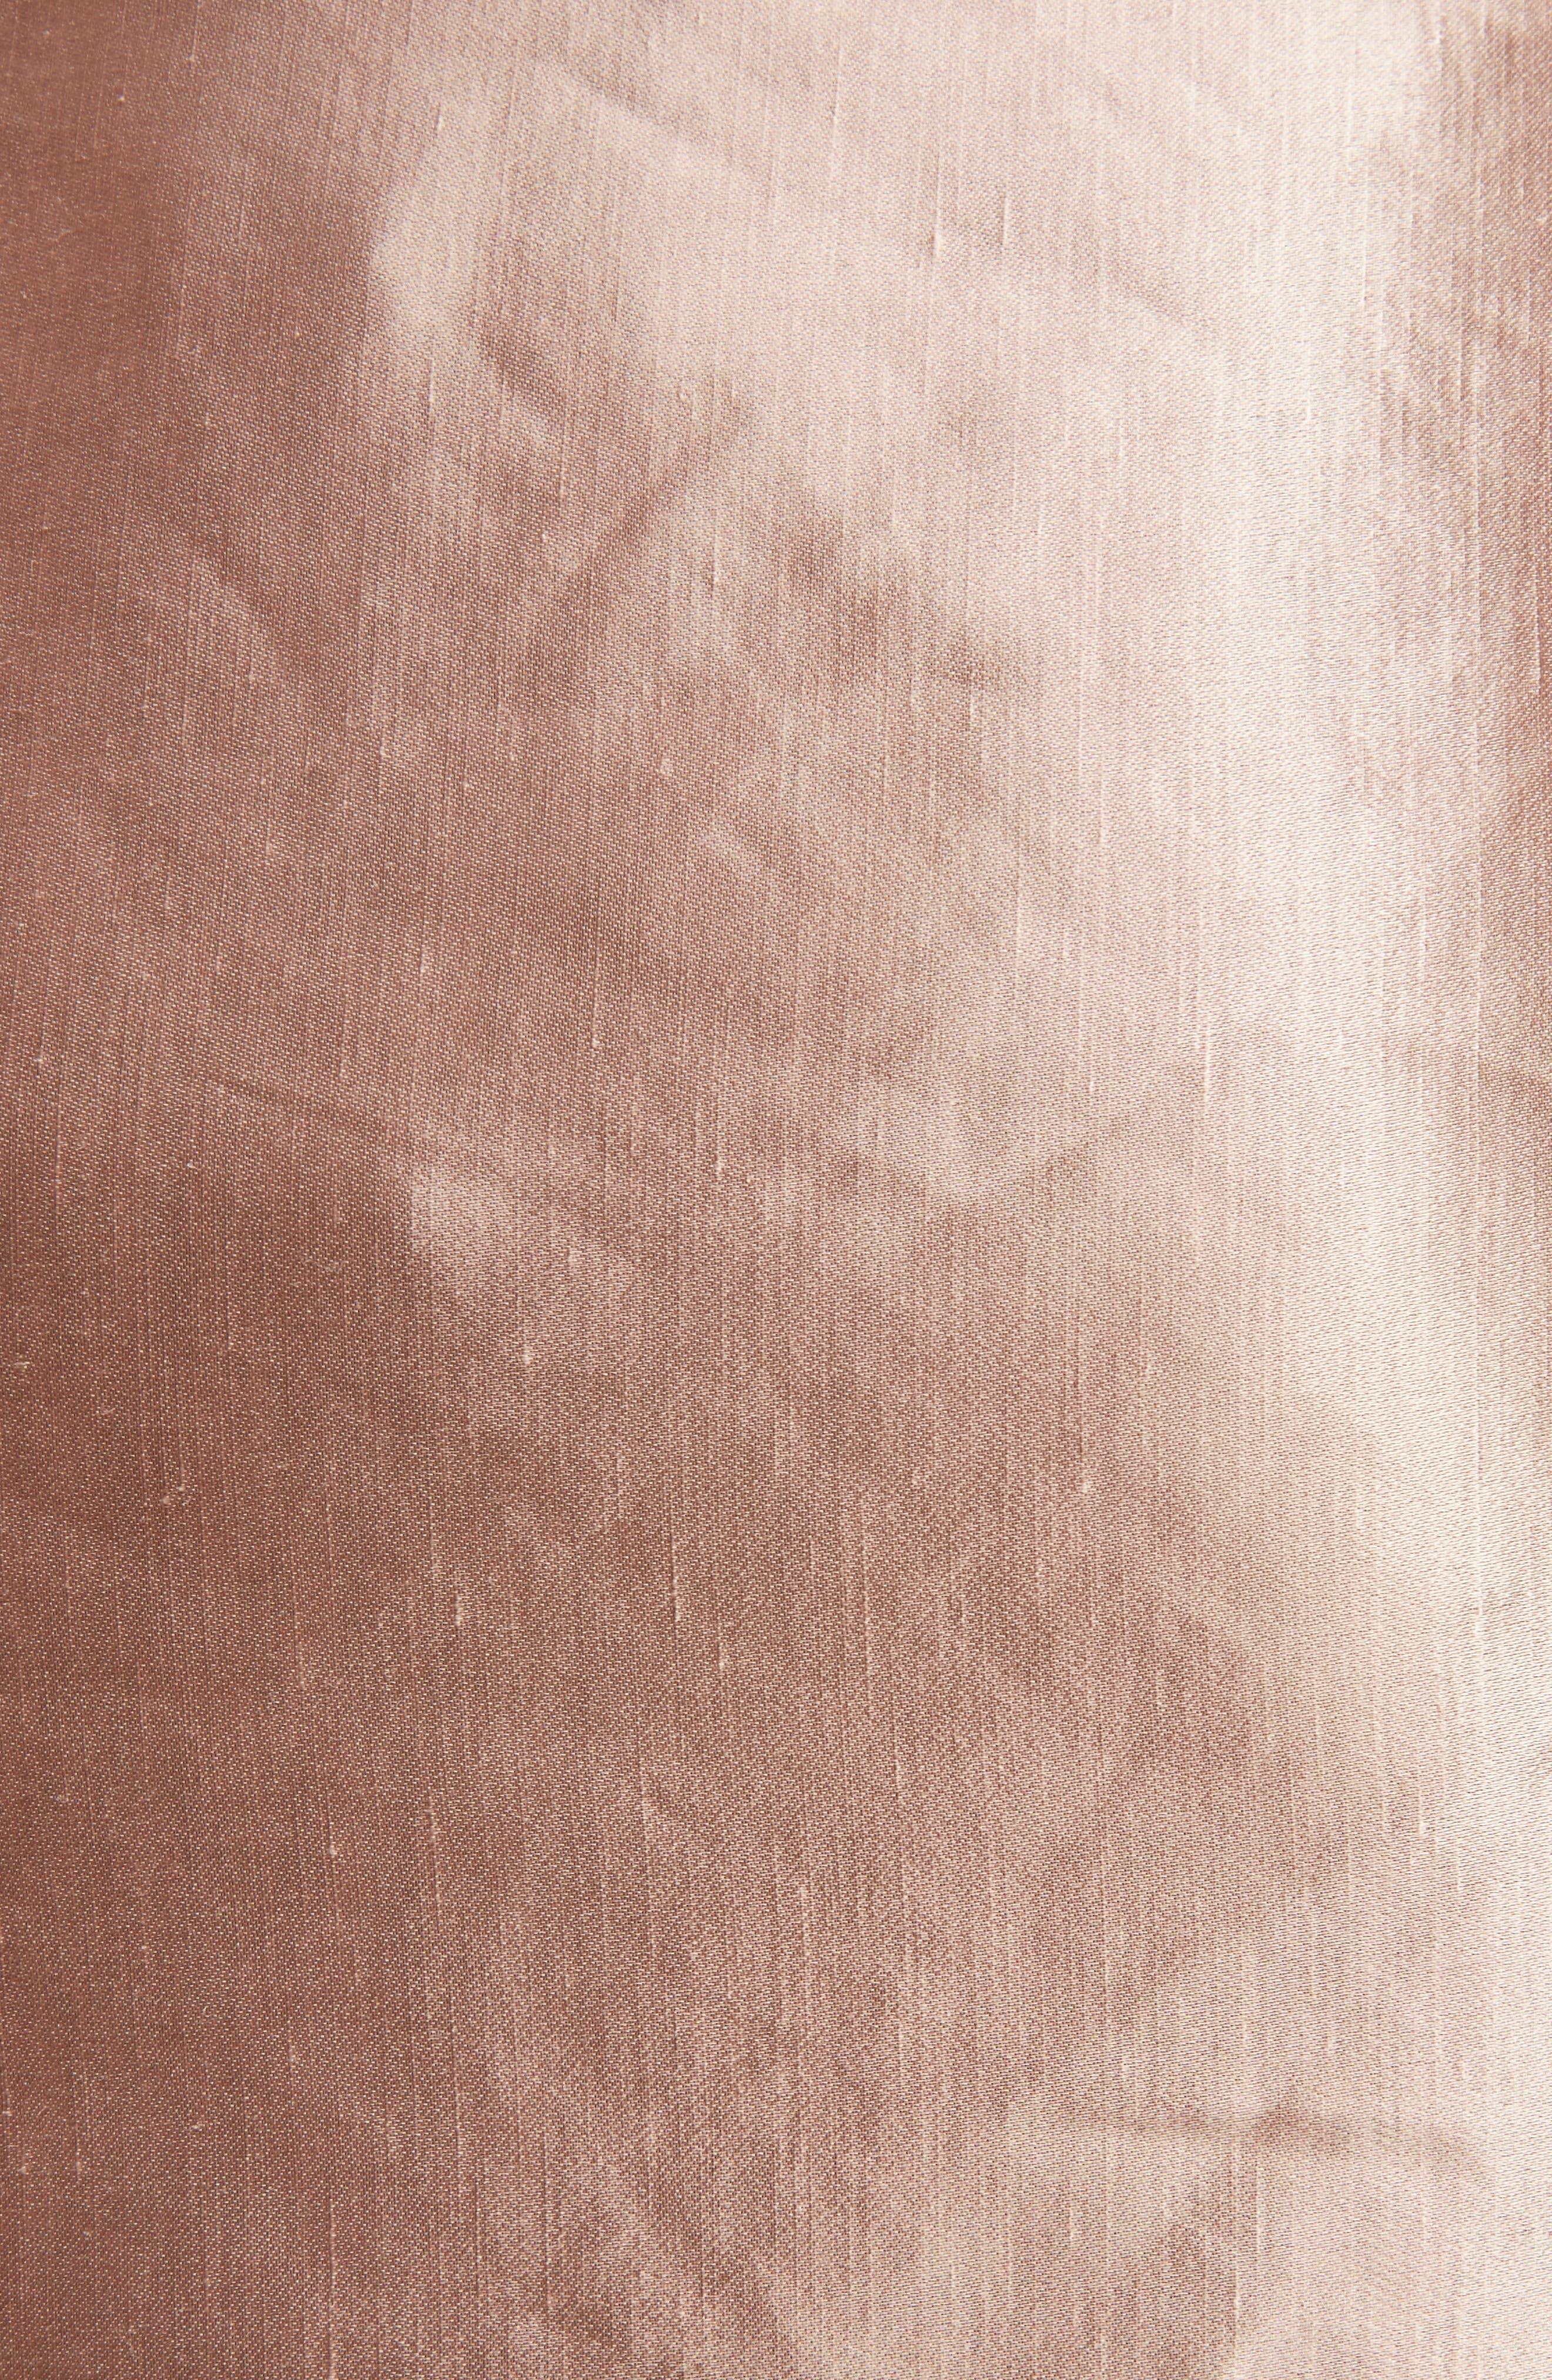 Scarf Satin Skirt,                             Alternate thumbnail 5, color,                             220